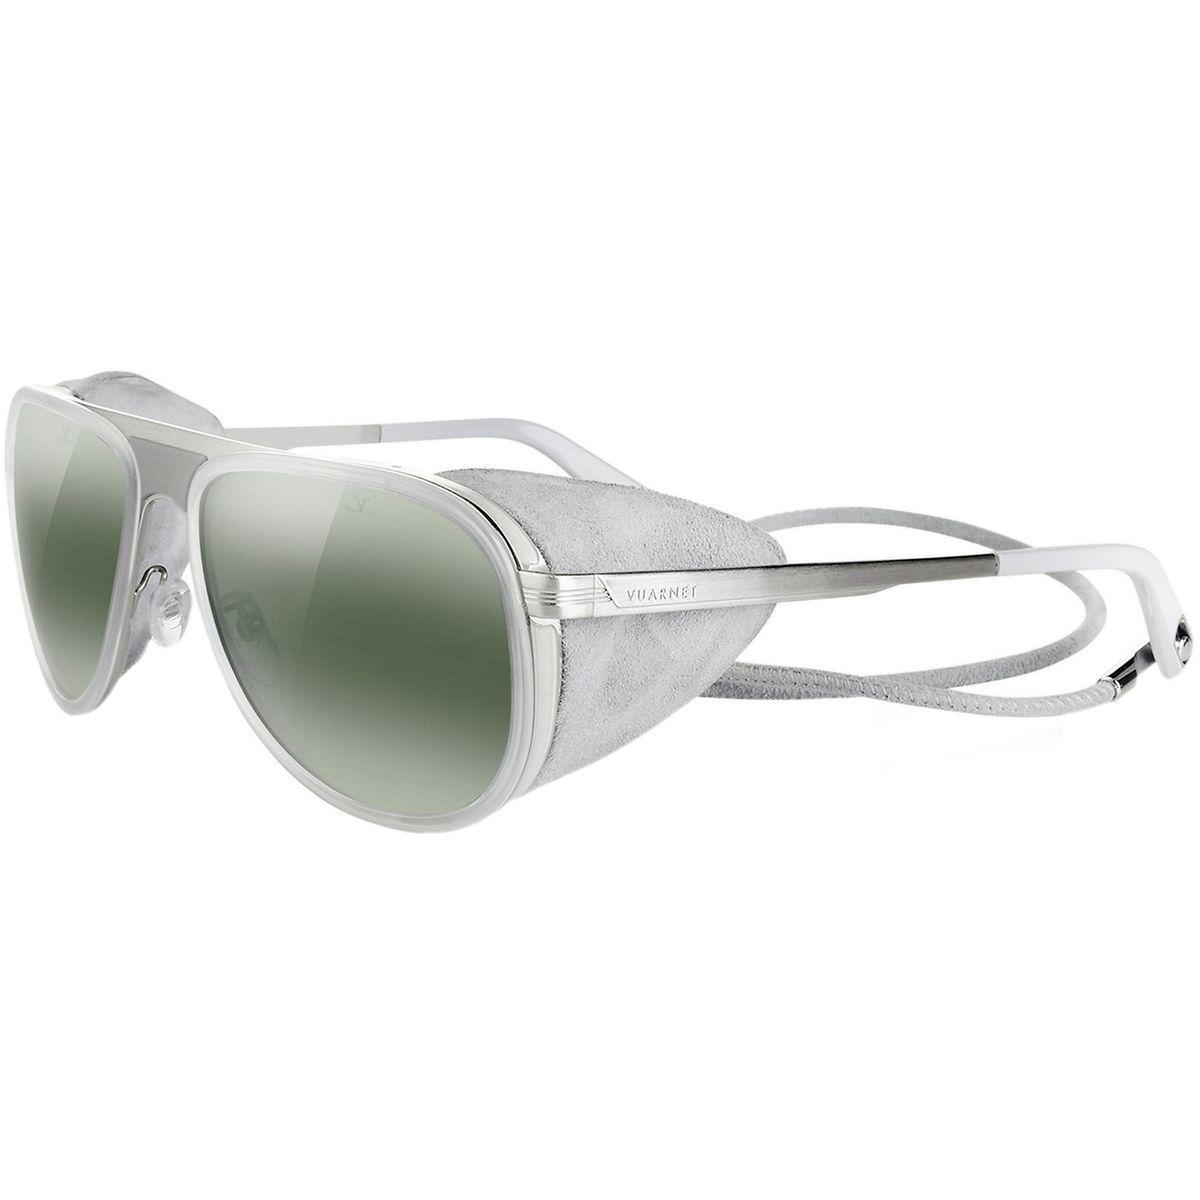 2cd344a9fb Lyst - Vuarnet Vl1315 Glacier Sunglasses in Gray for Men